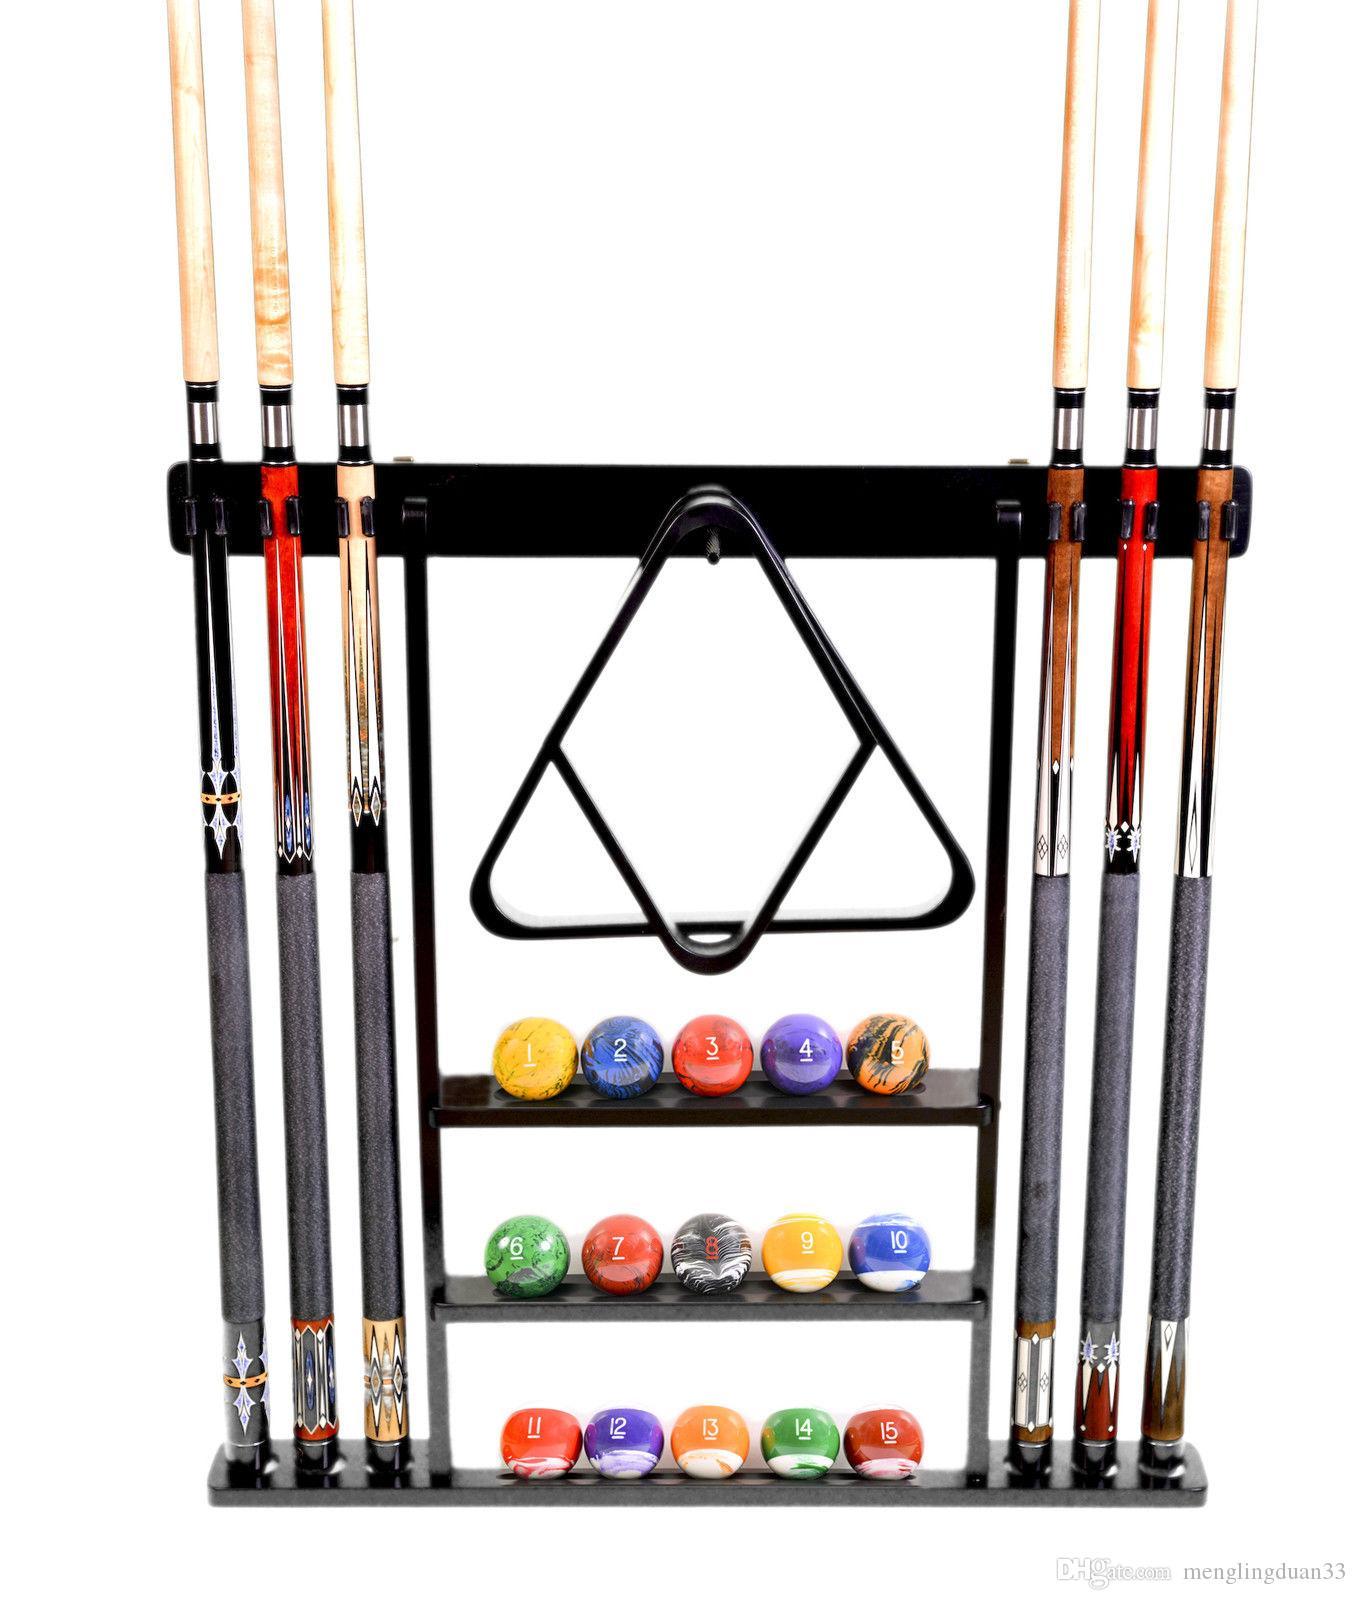 2017 billiard stick ball set wall rack holder black for Cue rack plans